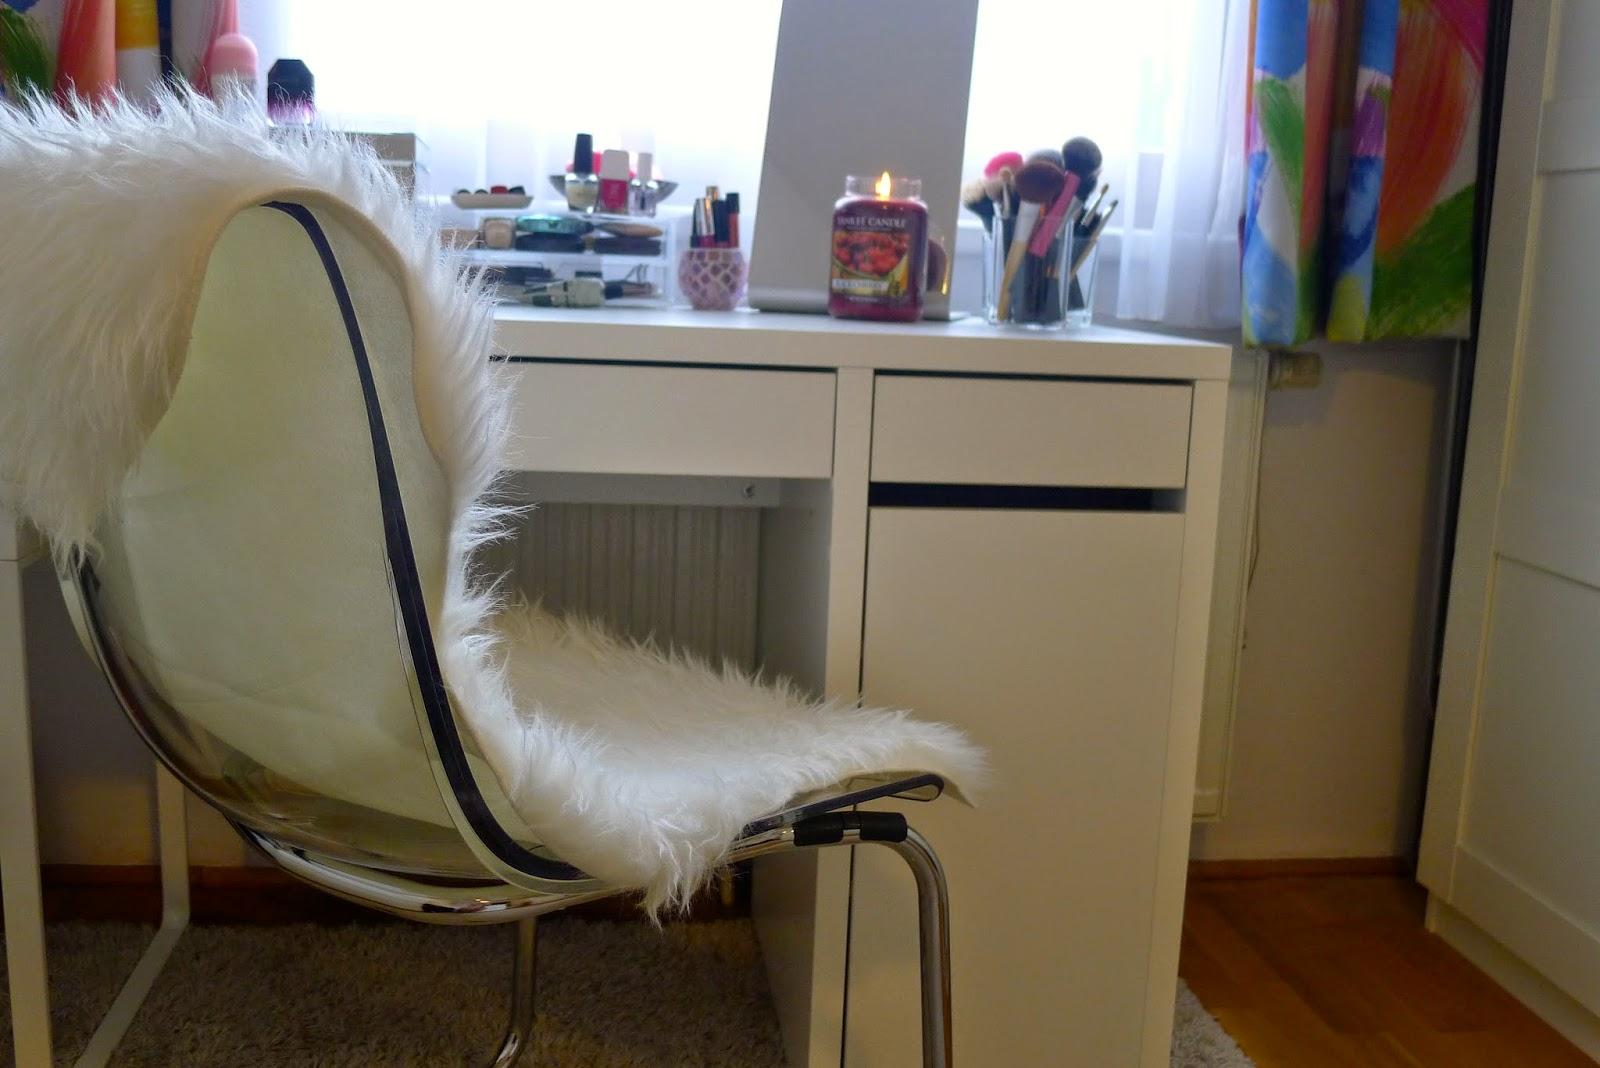 Stuhl tobias grau amazing xxcm camping stuhl reisestuhl - Durchsichtiger stuhl ikea ...